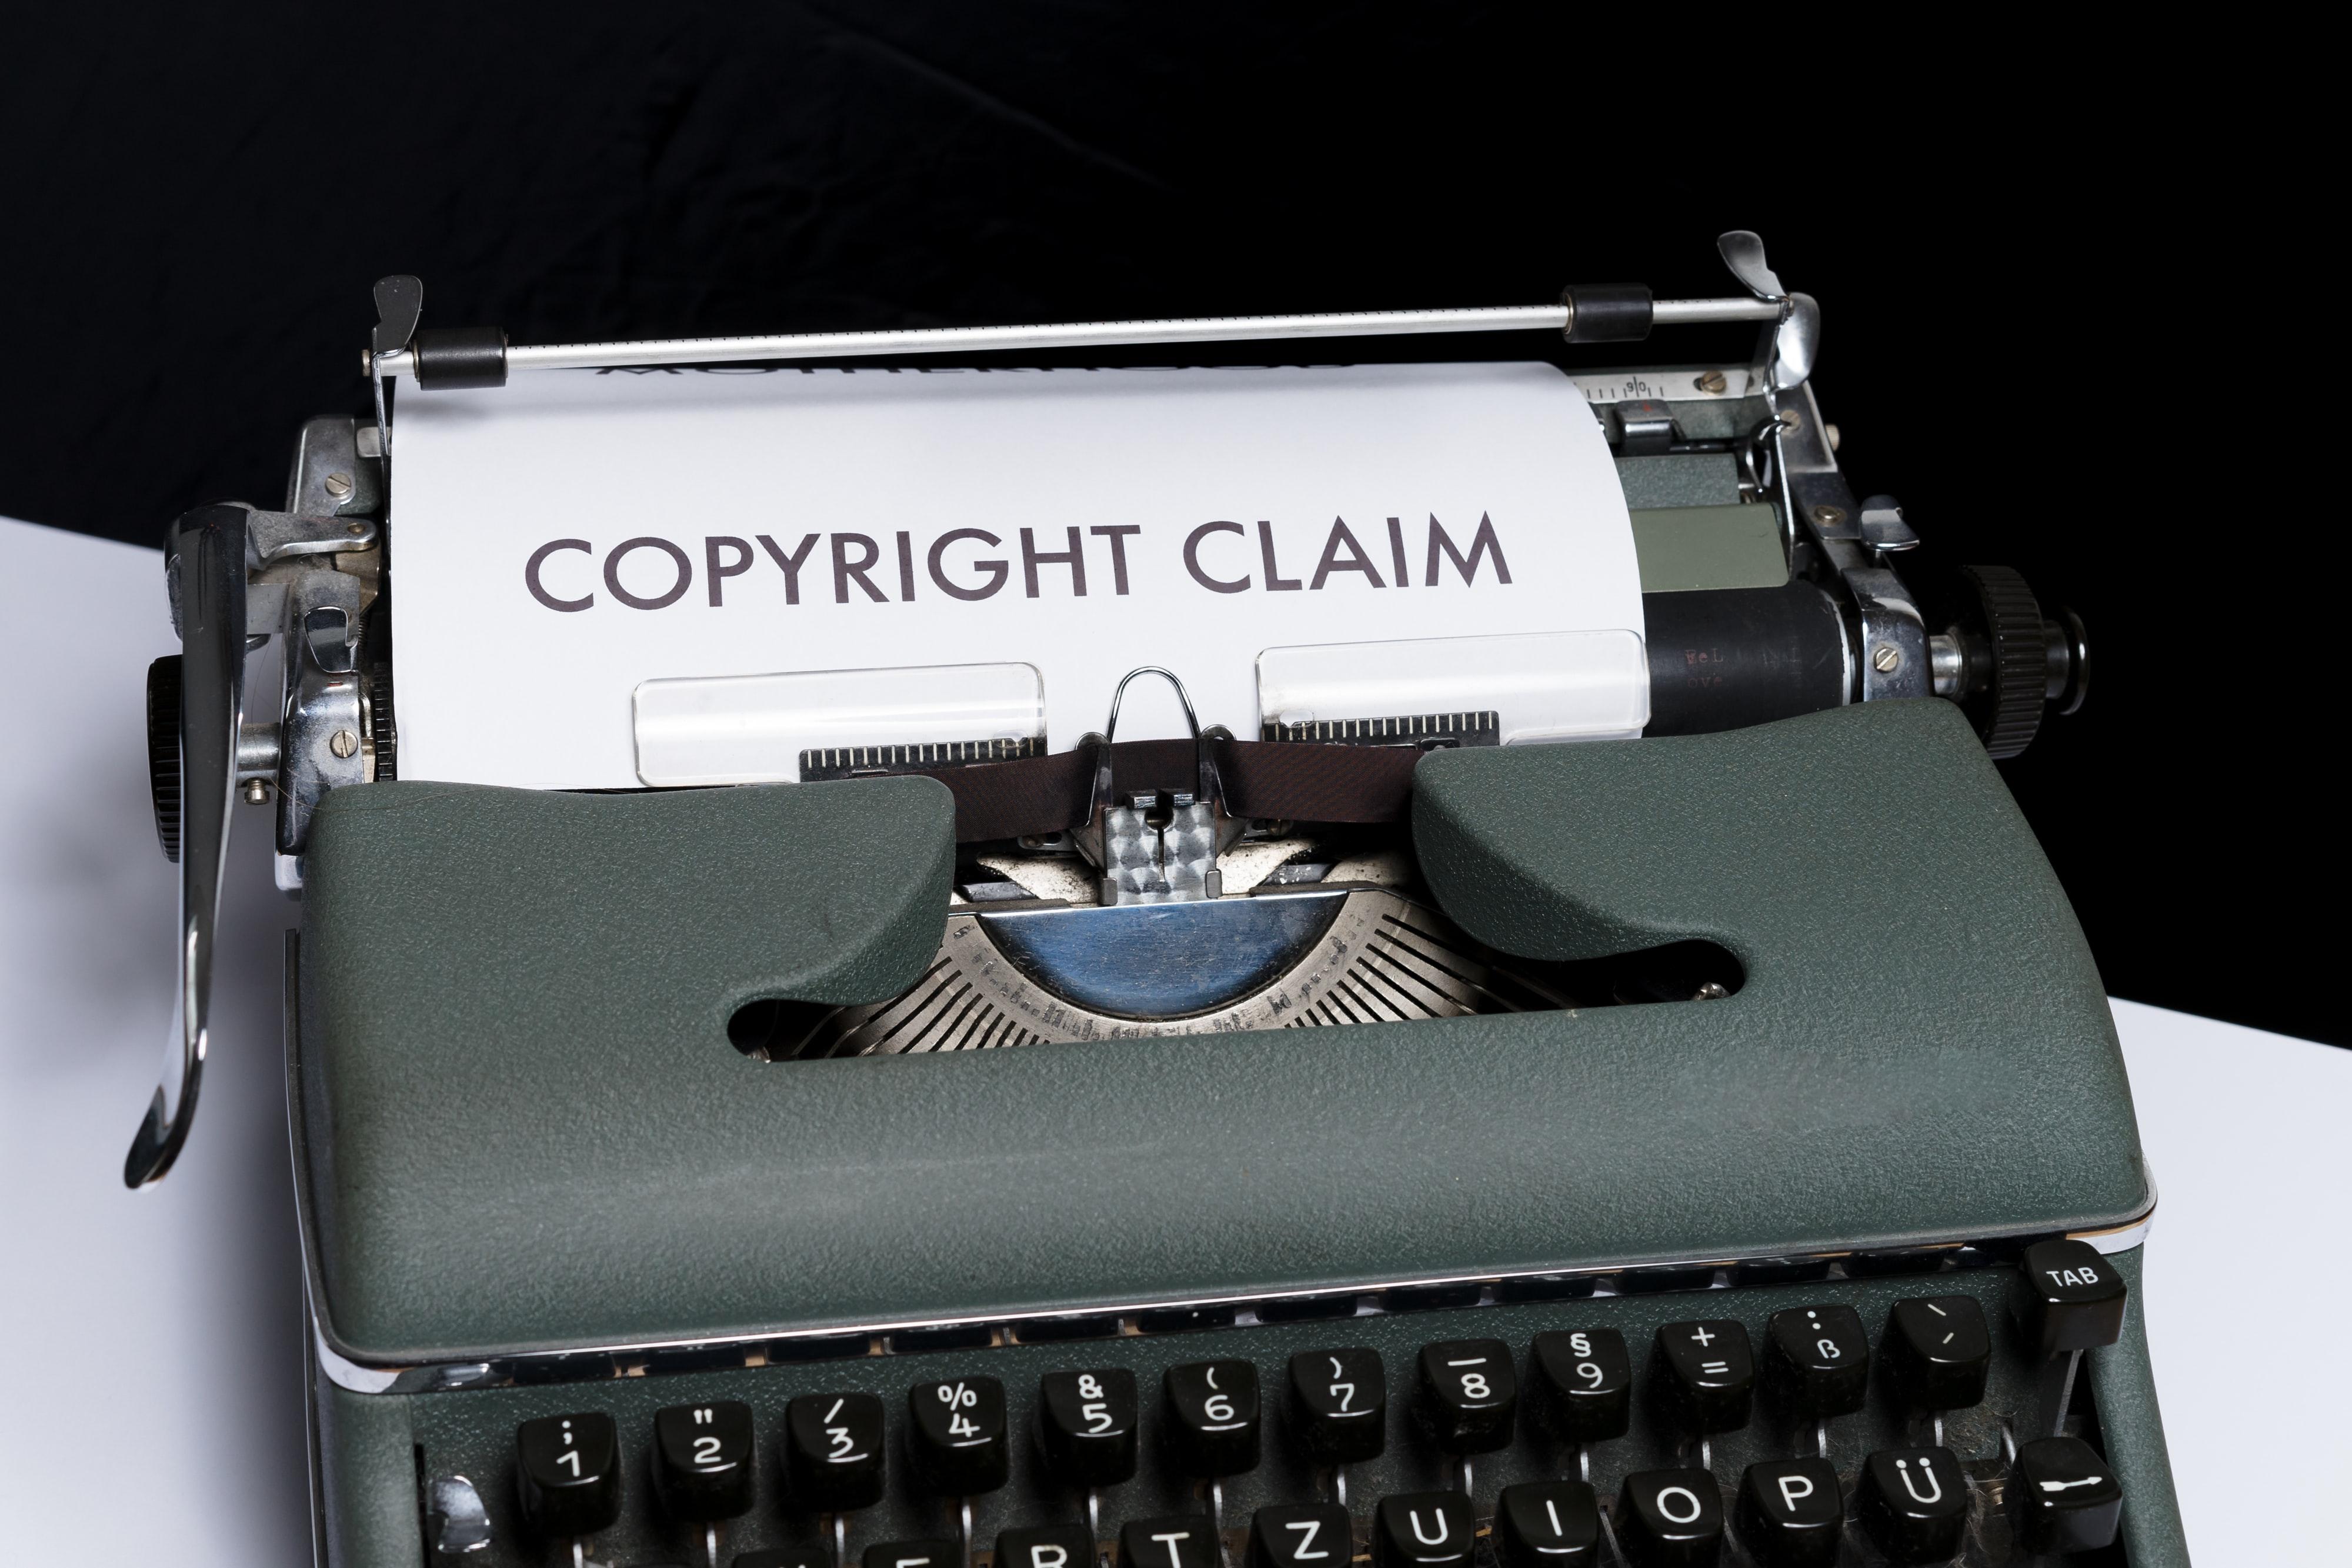 "Kuva 11. Photo by <a href=""https://unsplash.com/@markuswinkler?utm_source=unsplash&utm_medium=referral&utm_content=creditCopyText"">Markus Winkler</a> on <a href=""https://unsplash.com/s/photos/copyright?utm_source=unsplash&utm_medium=referral&utm_content=creditCopyText"">Unsplash</a>"